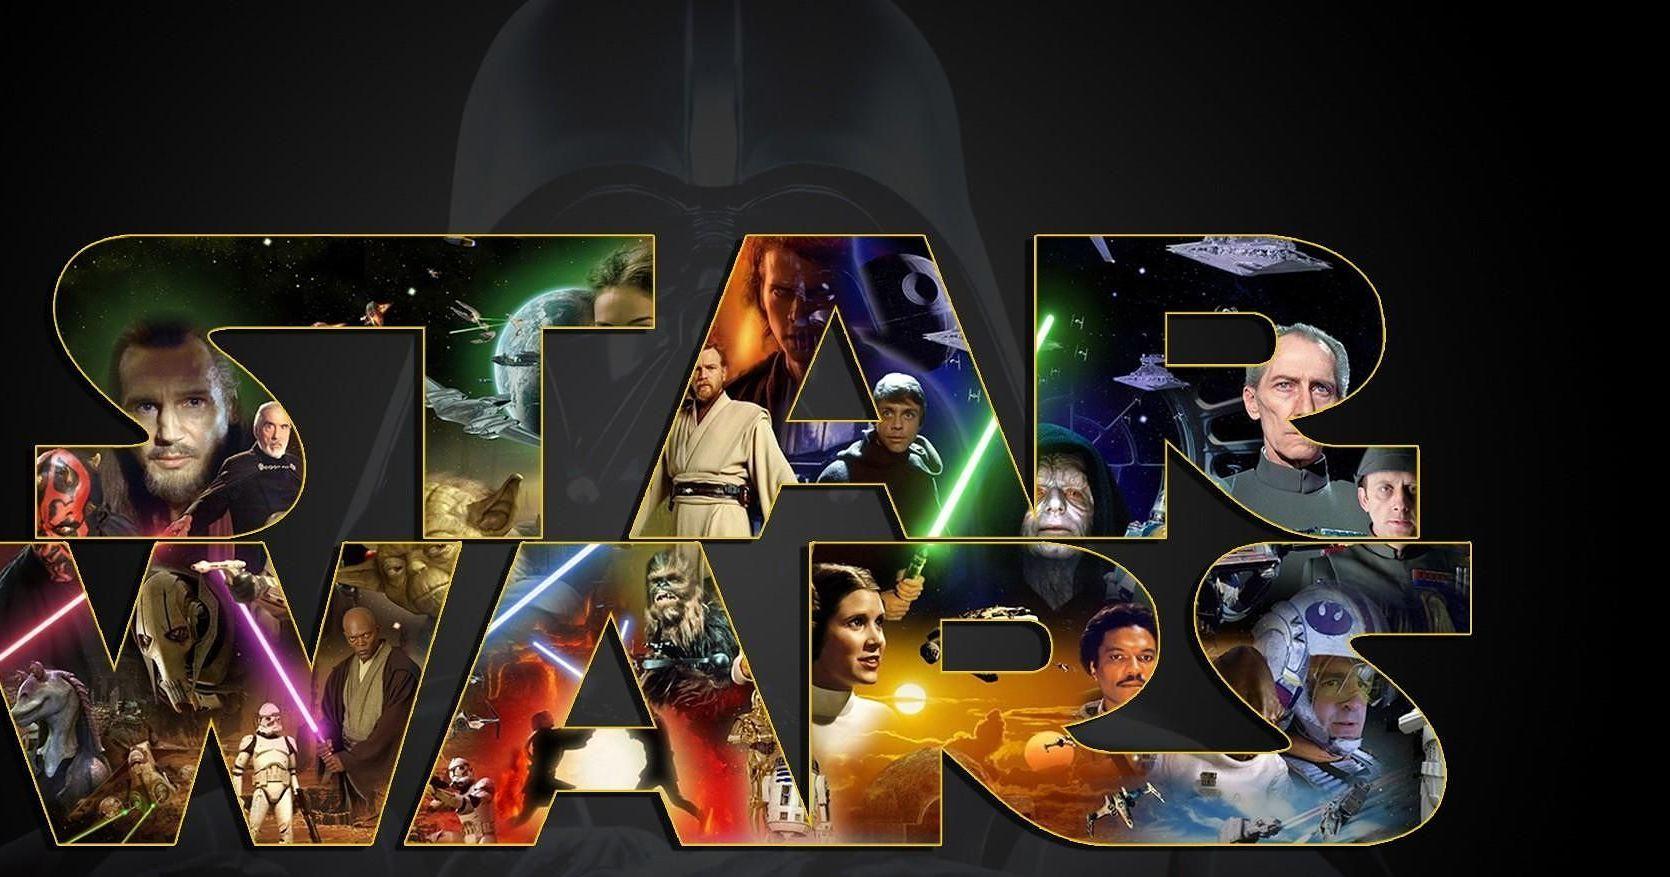 jedism the religion of star wars essay